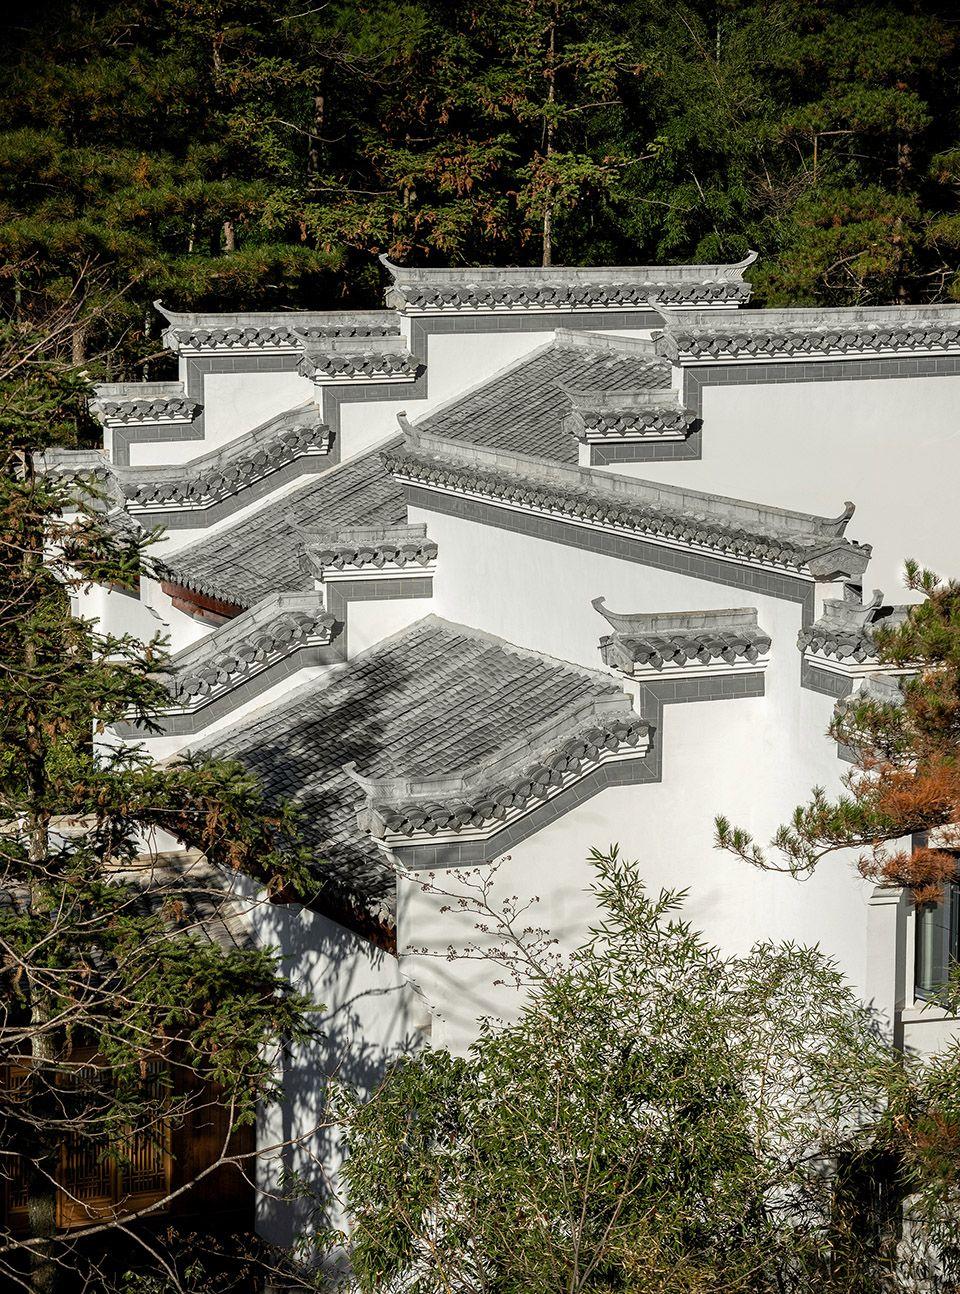 sunriver resort spa huangshan by cheng chung design hk architectural elements sunriver resort green scenery